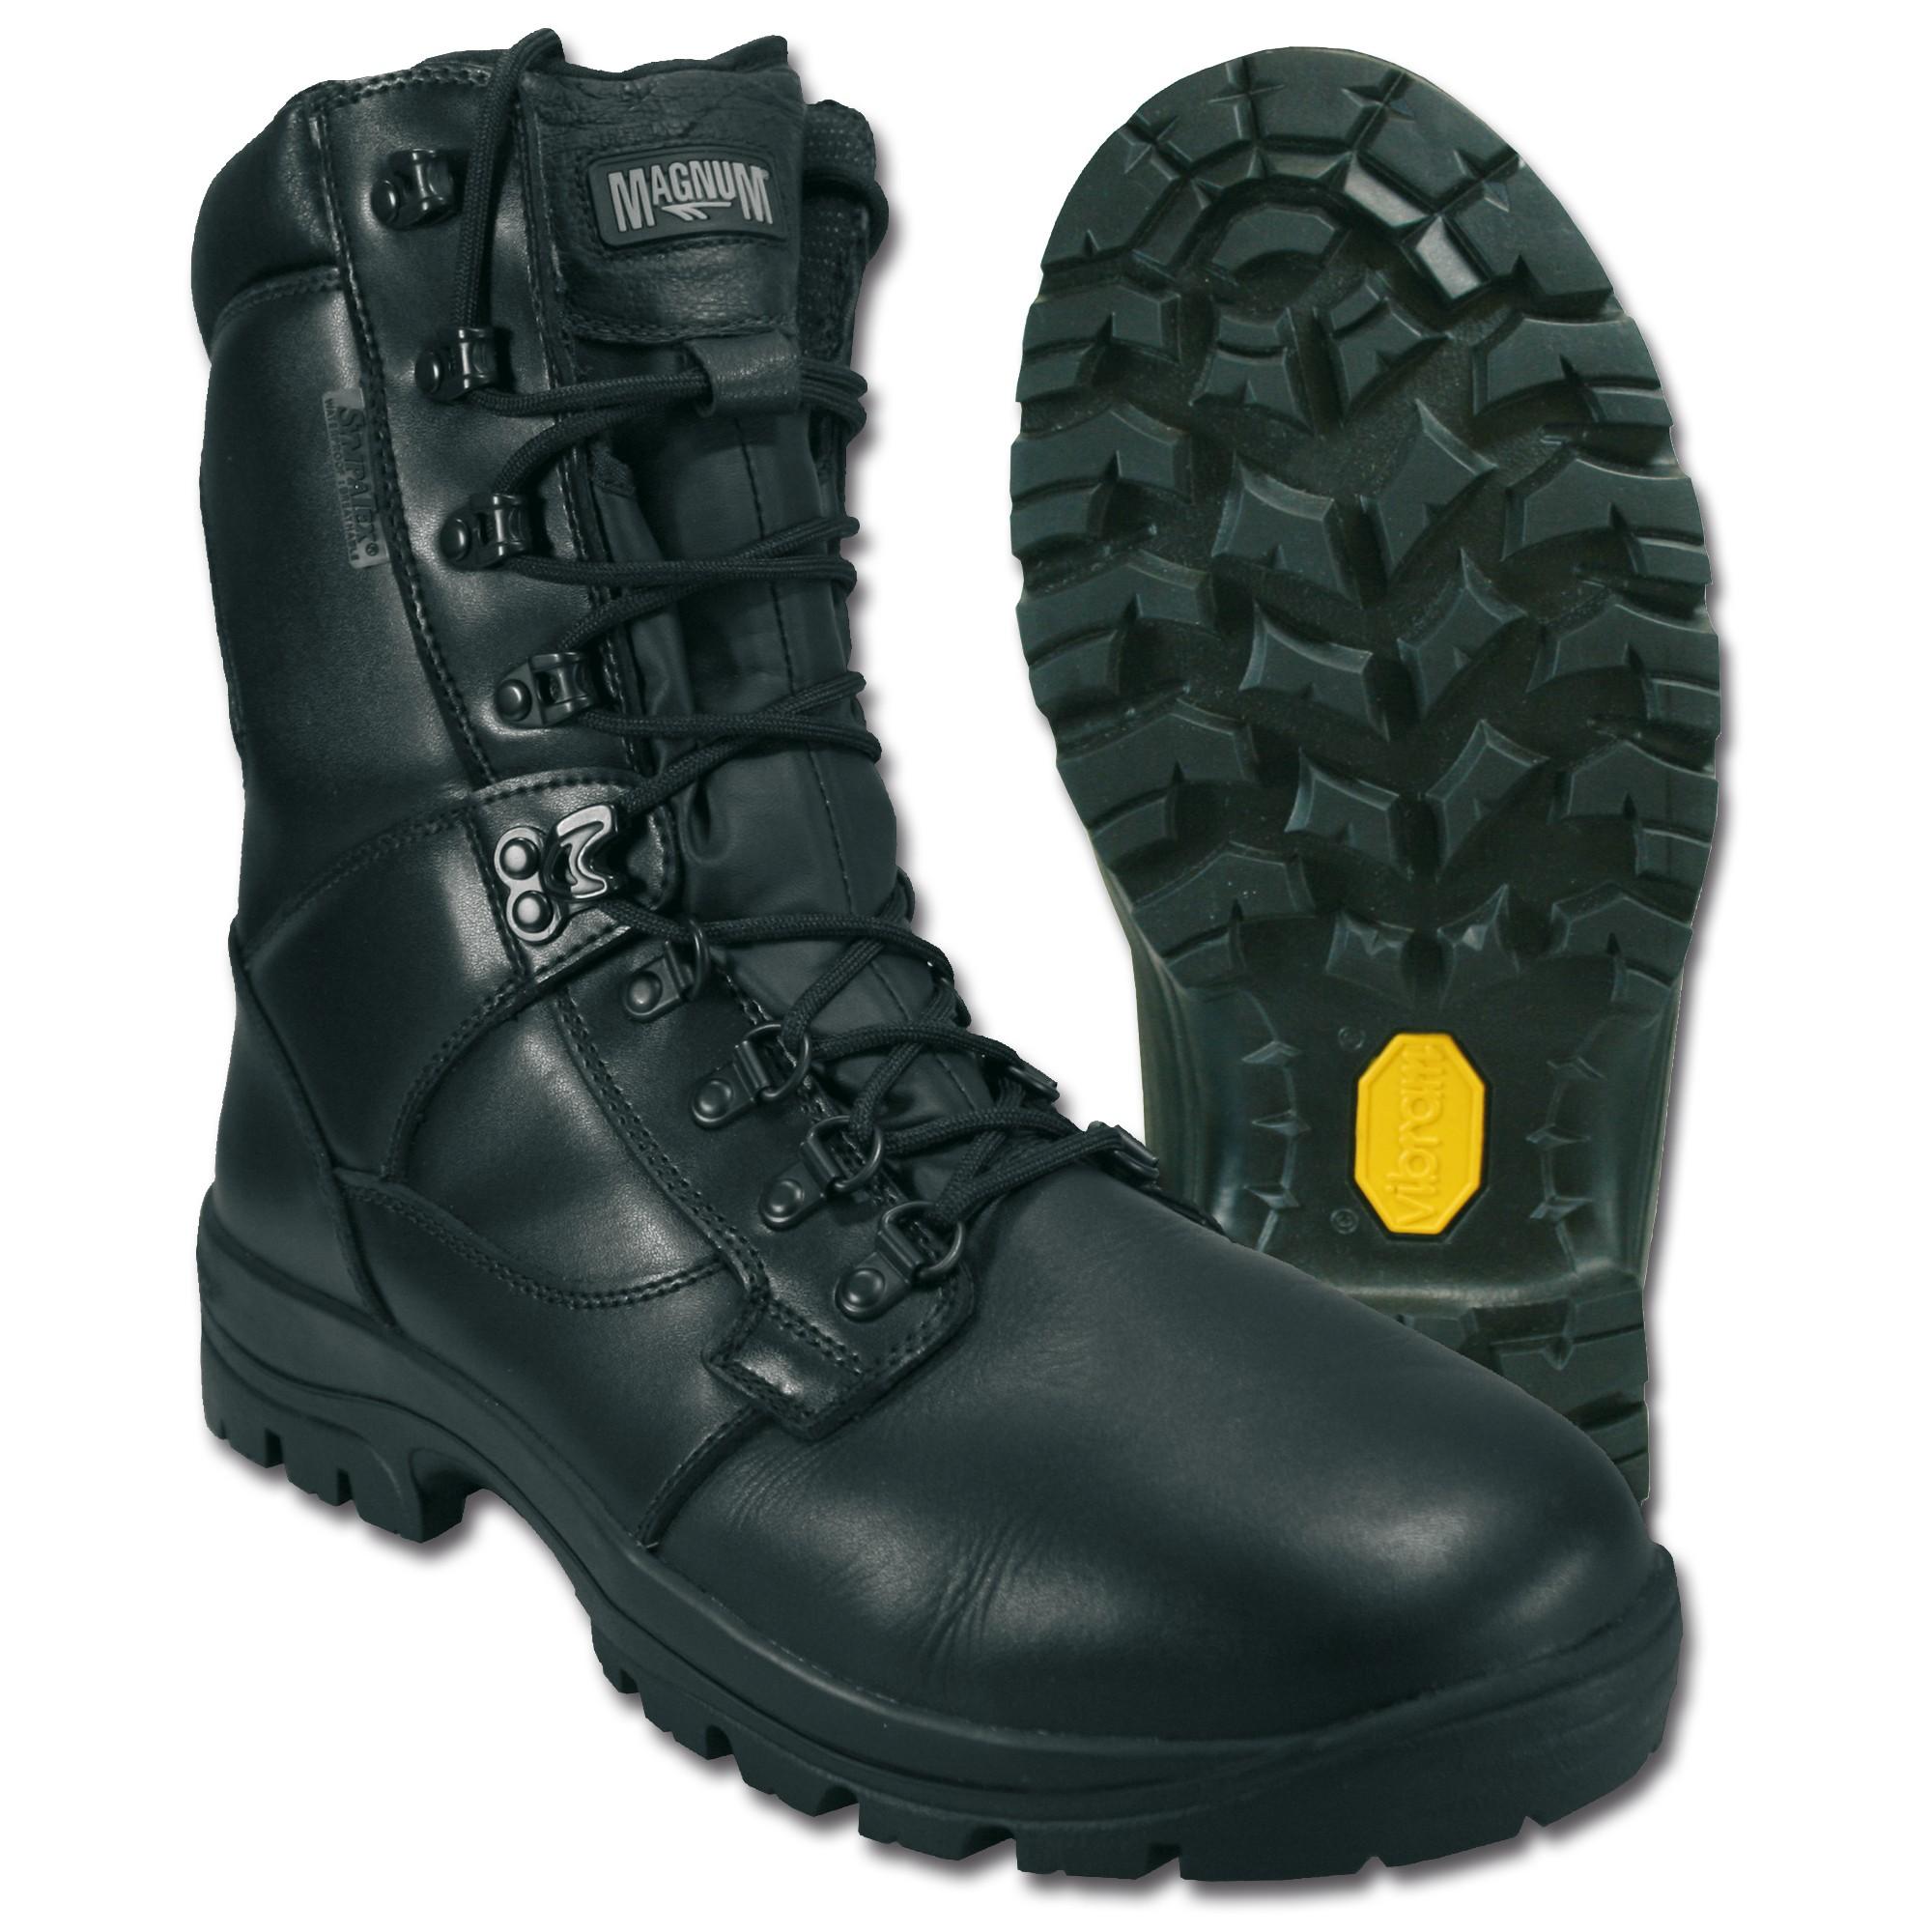 Boots Magnum Hi-Tec Elite II Leather